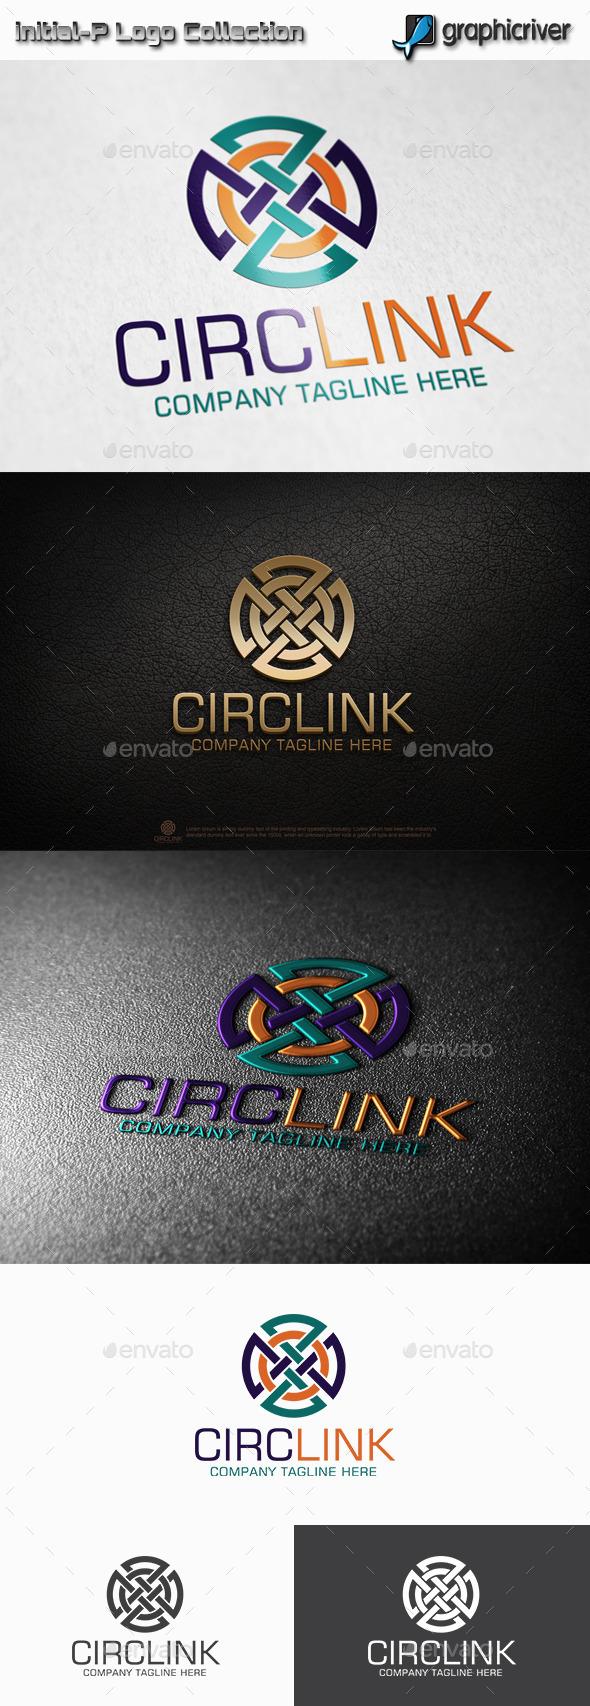 Circlink - Circle Link Logo